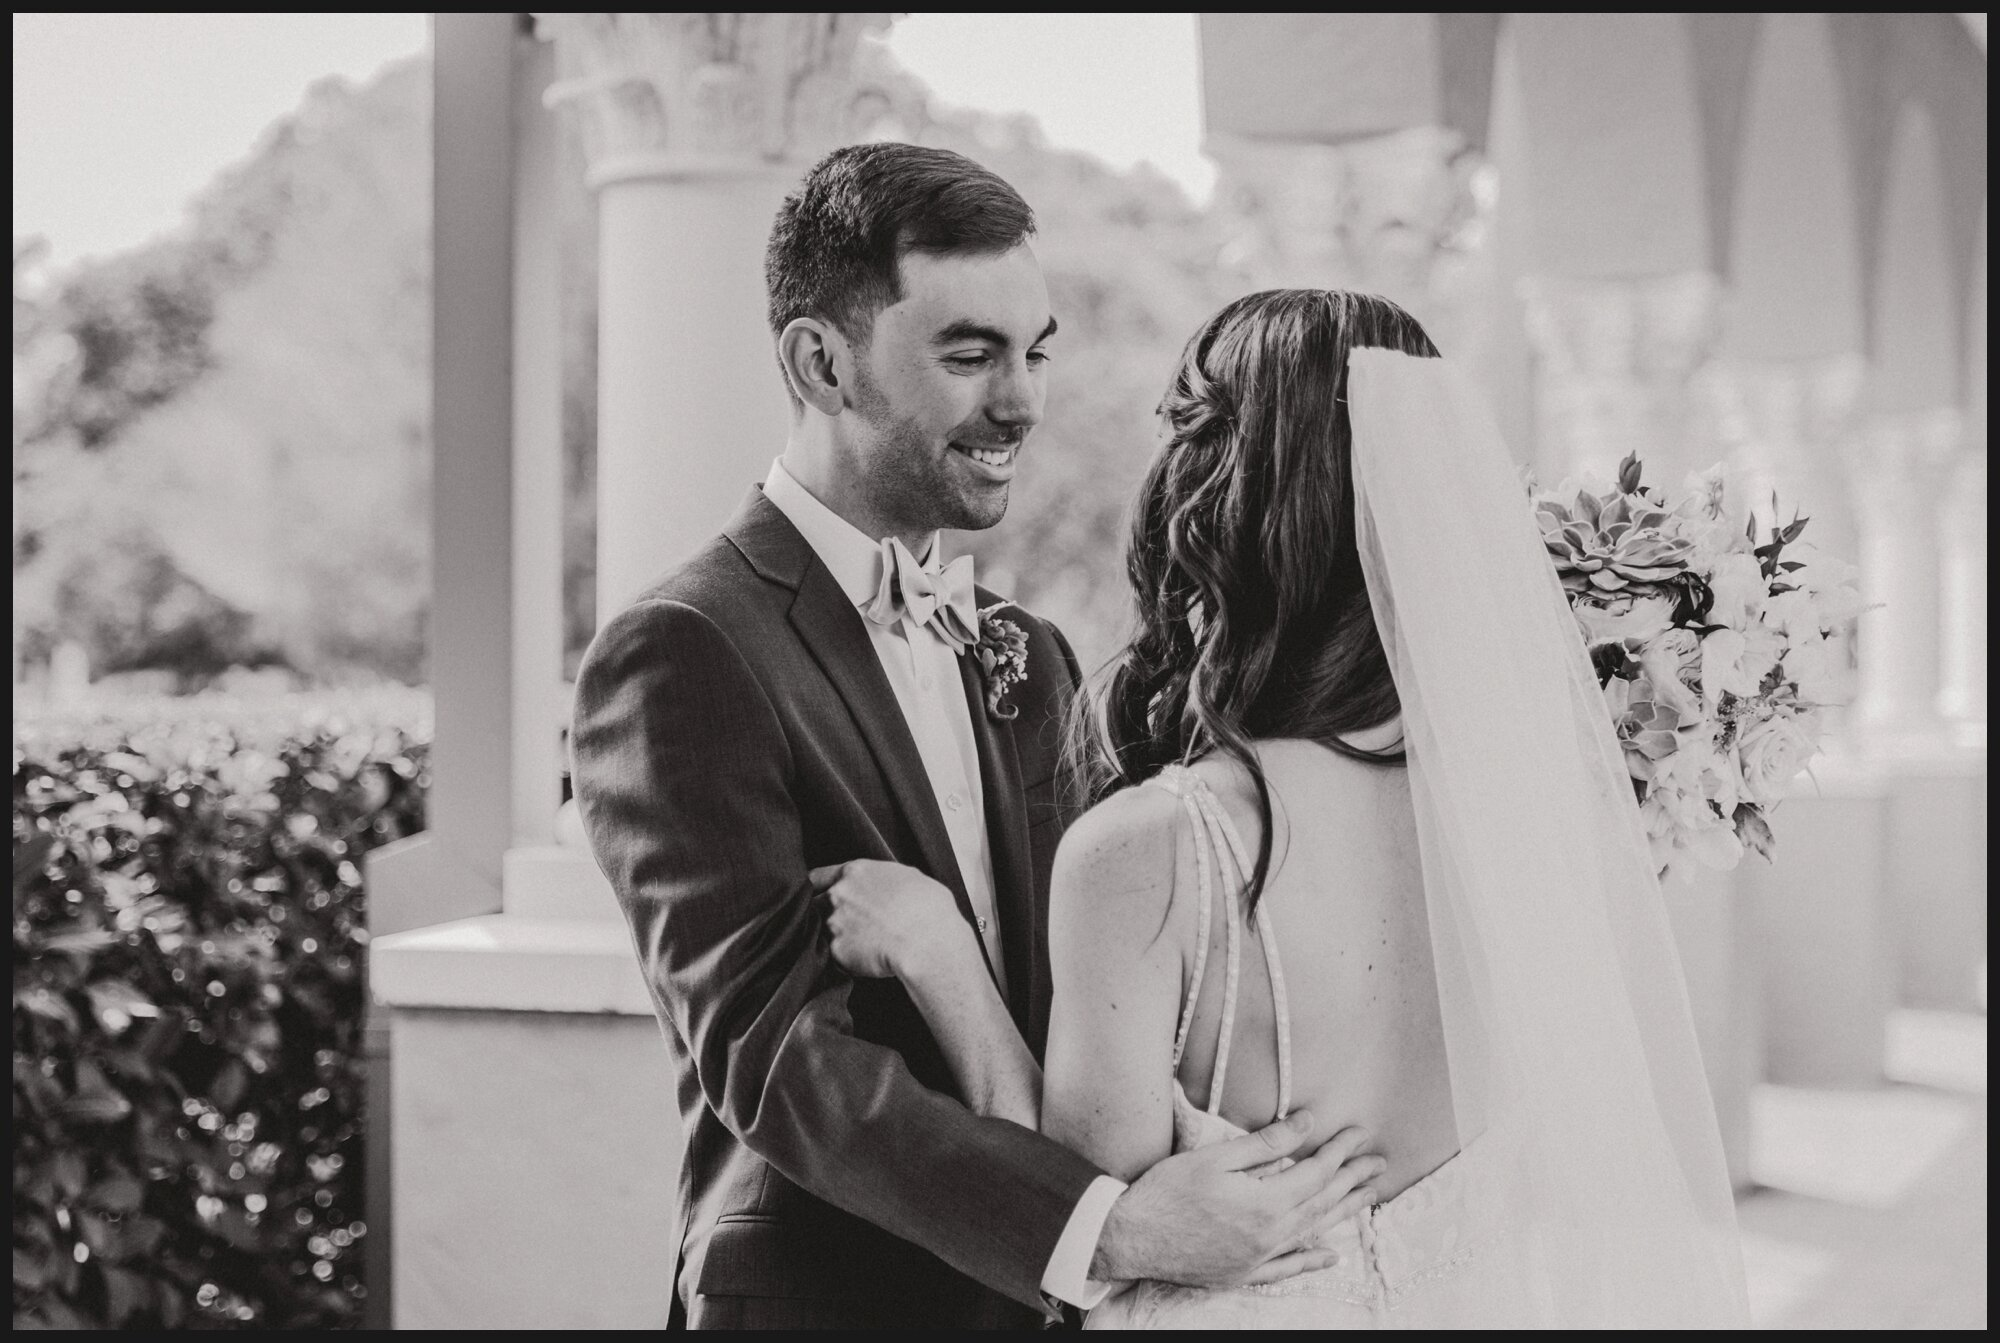 Orlando-Wedding-Photographer-destination-wedding-photographer-florida-wedding-photographer-hawaii-wedding-photographer_0664.jpg